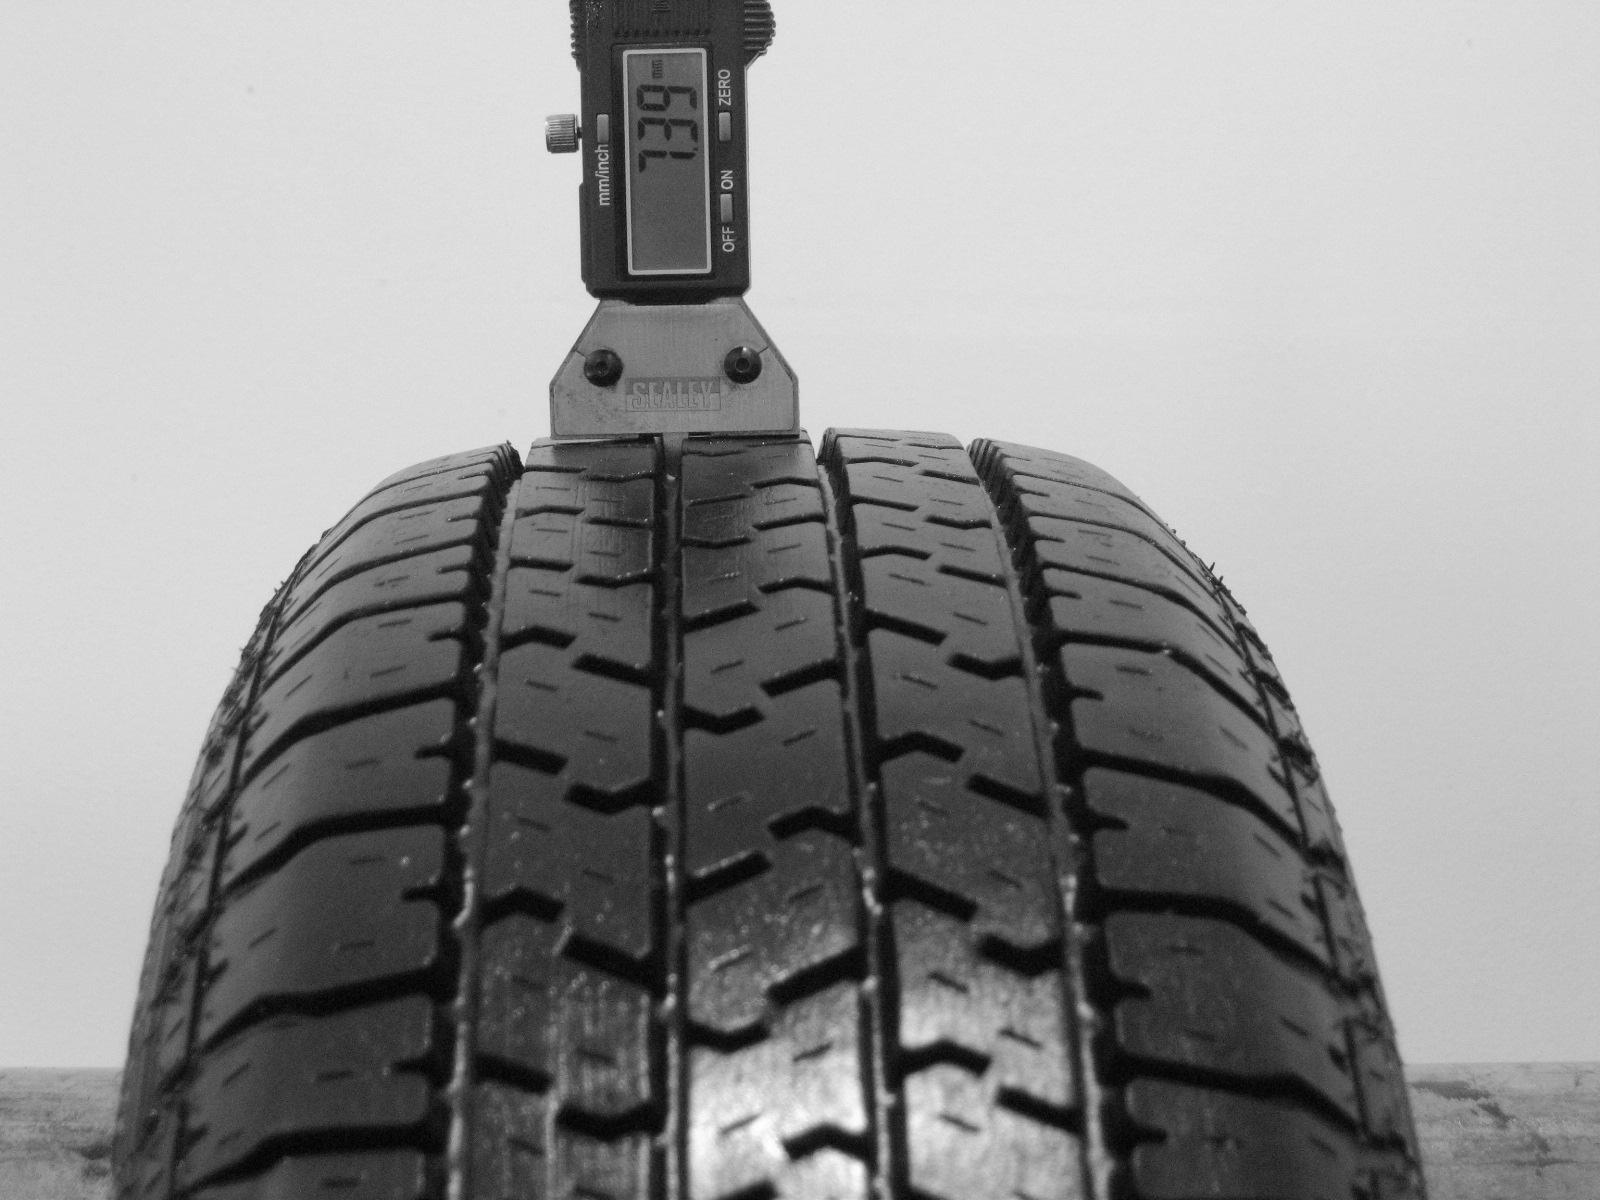 Použité-Pneu-Bazar - 185/65 R15 CONTINENTAL SUPER CONTACT-kusovka-rezerva 3mm